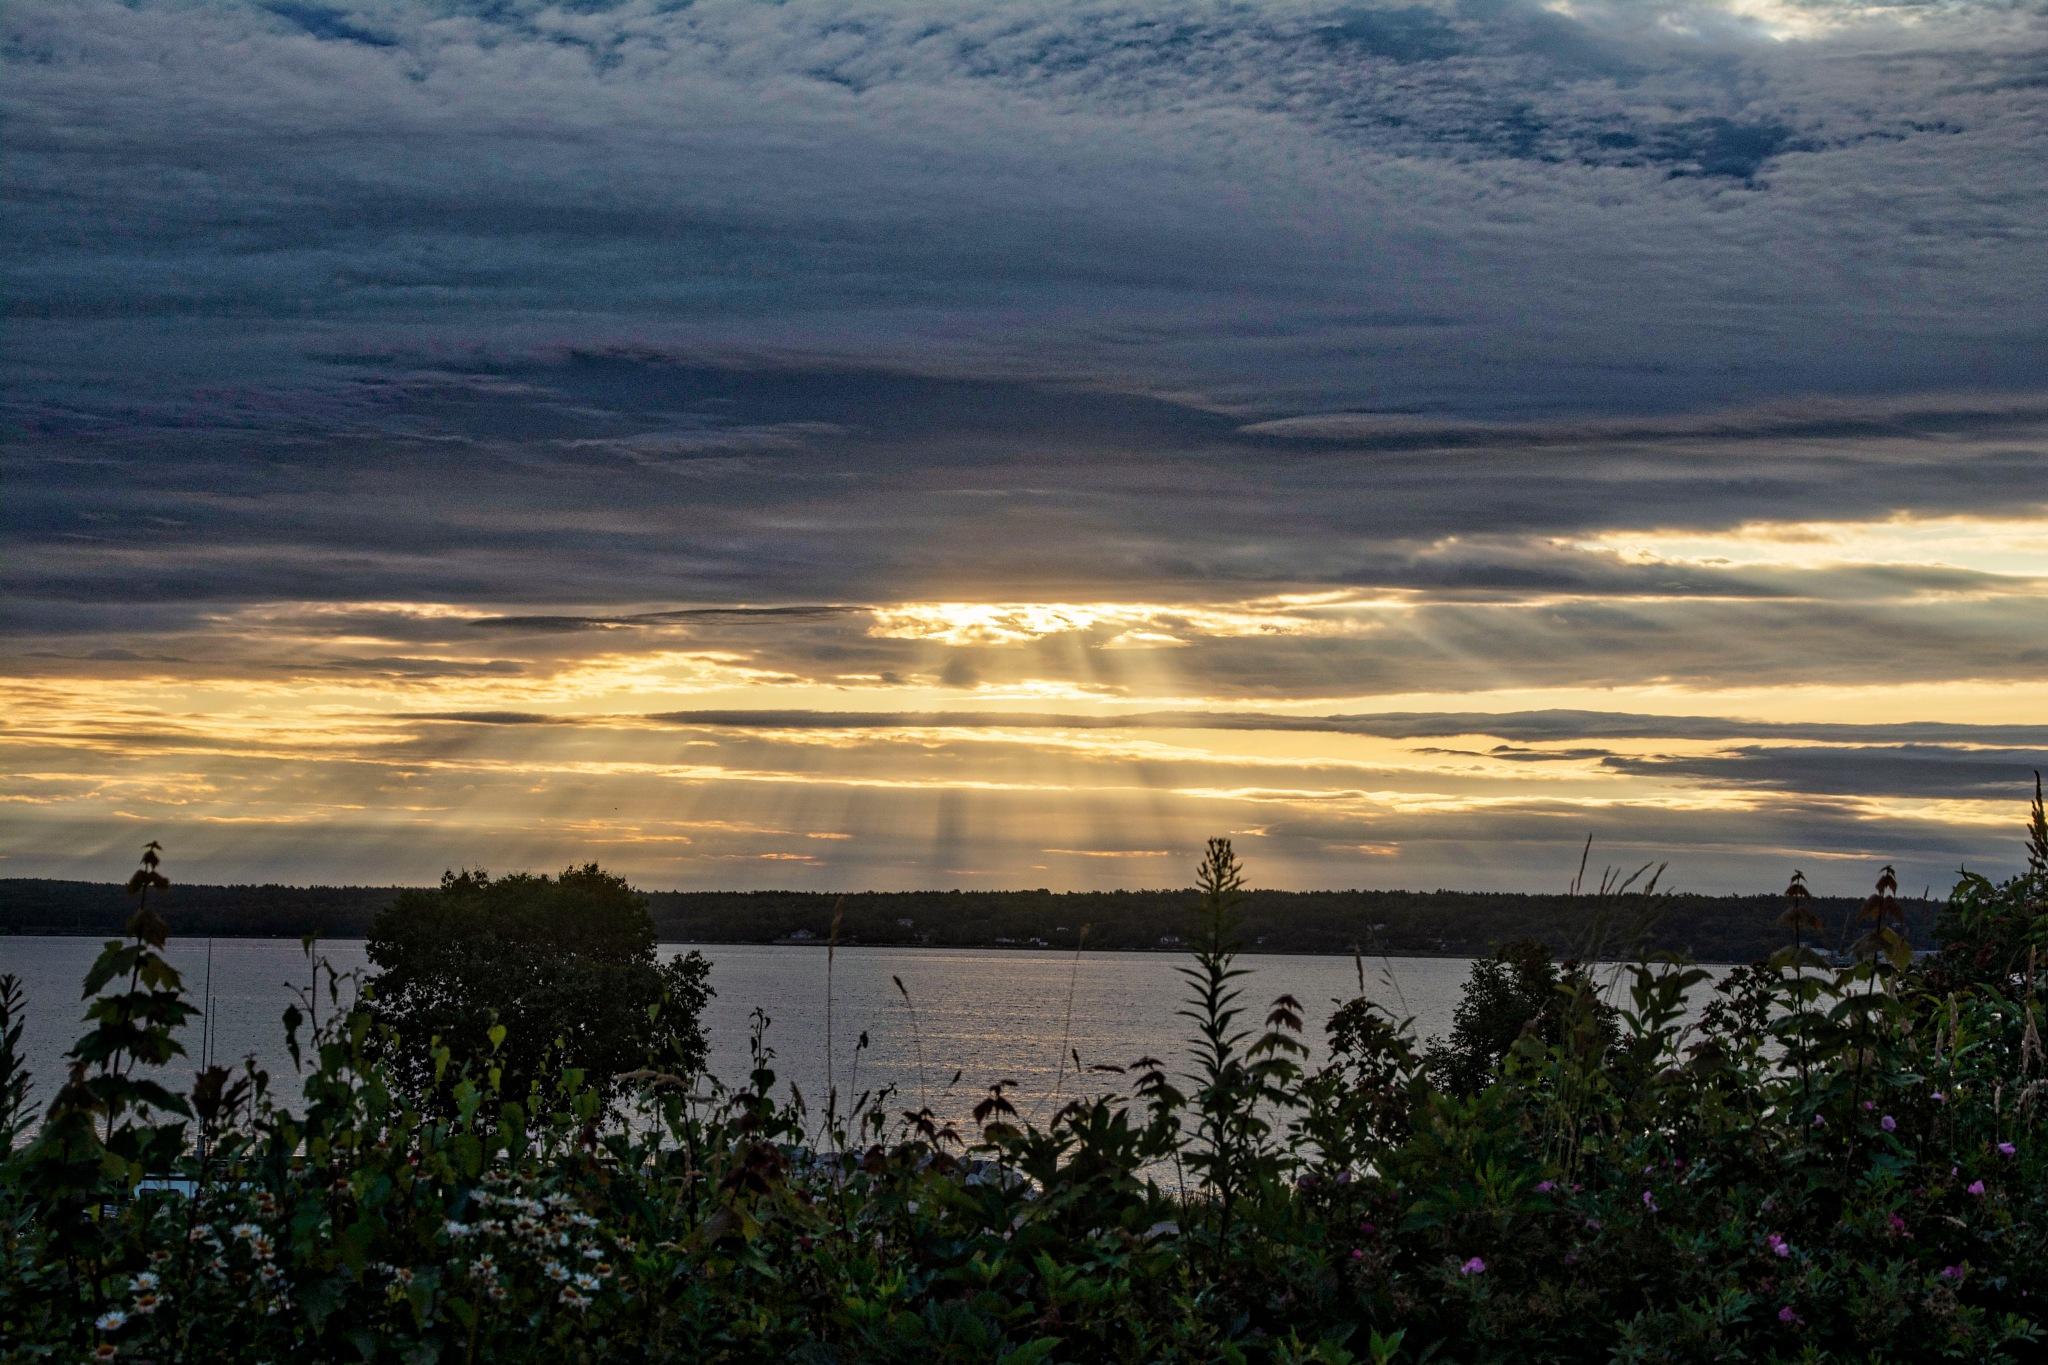 Golden Rays by Wayne L. Talbot